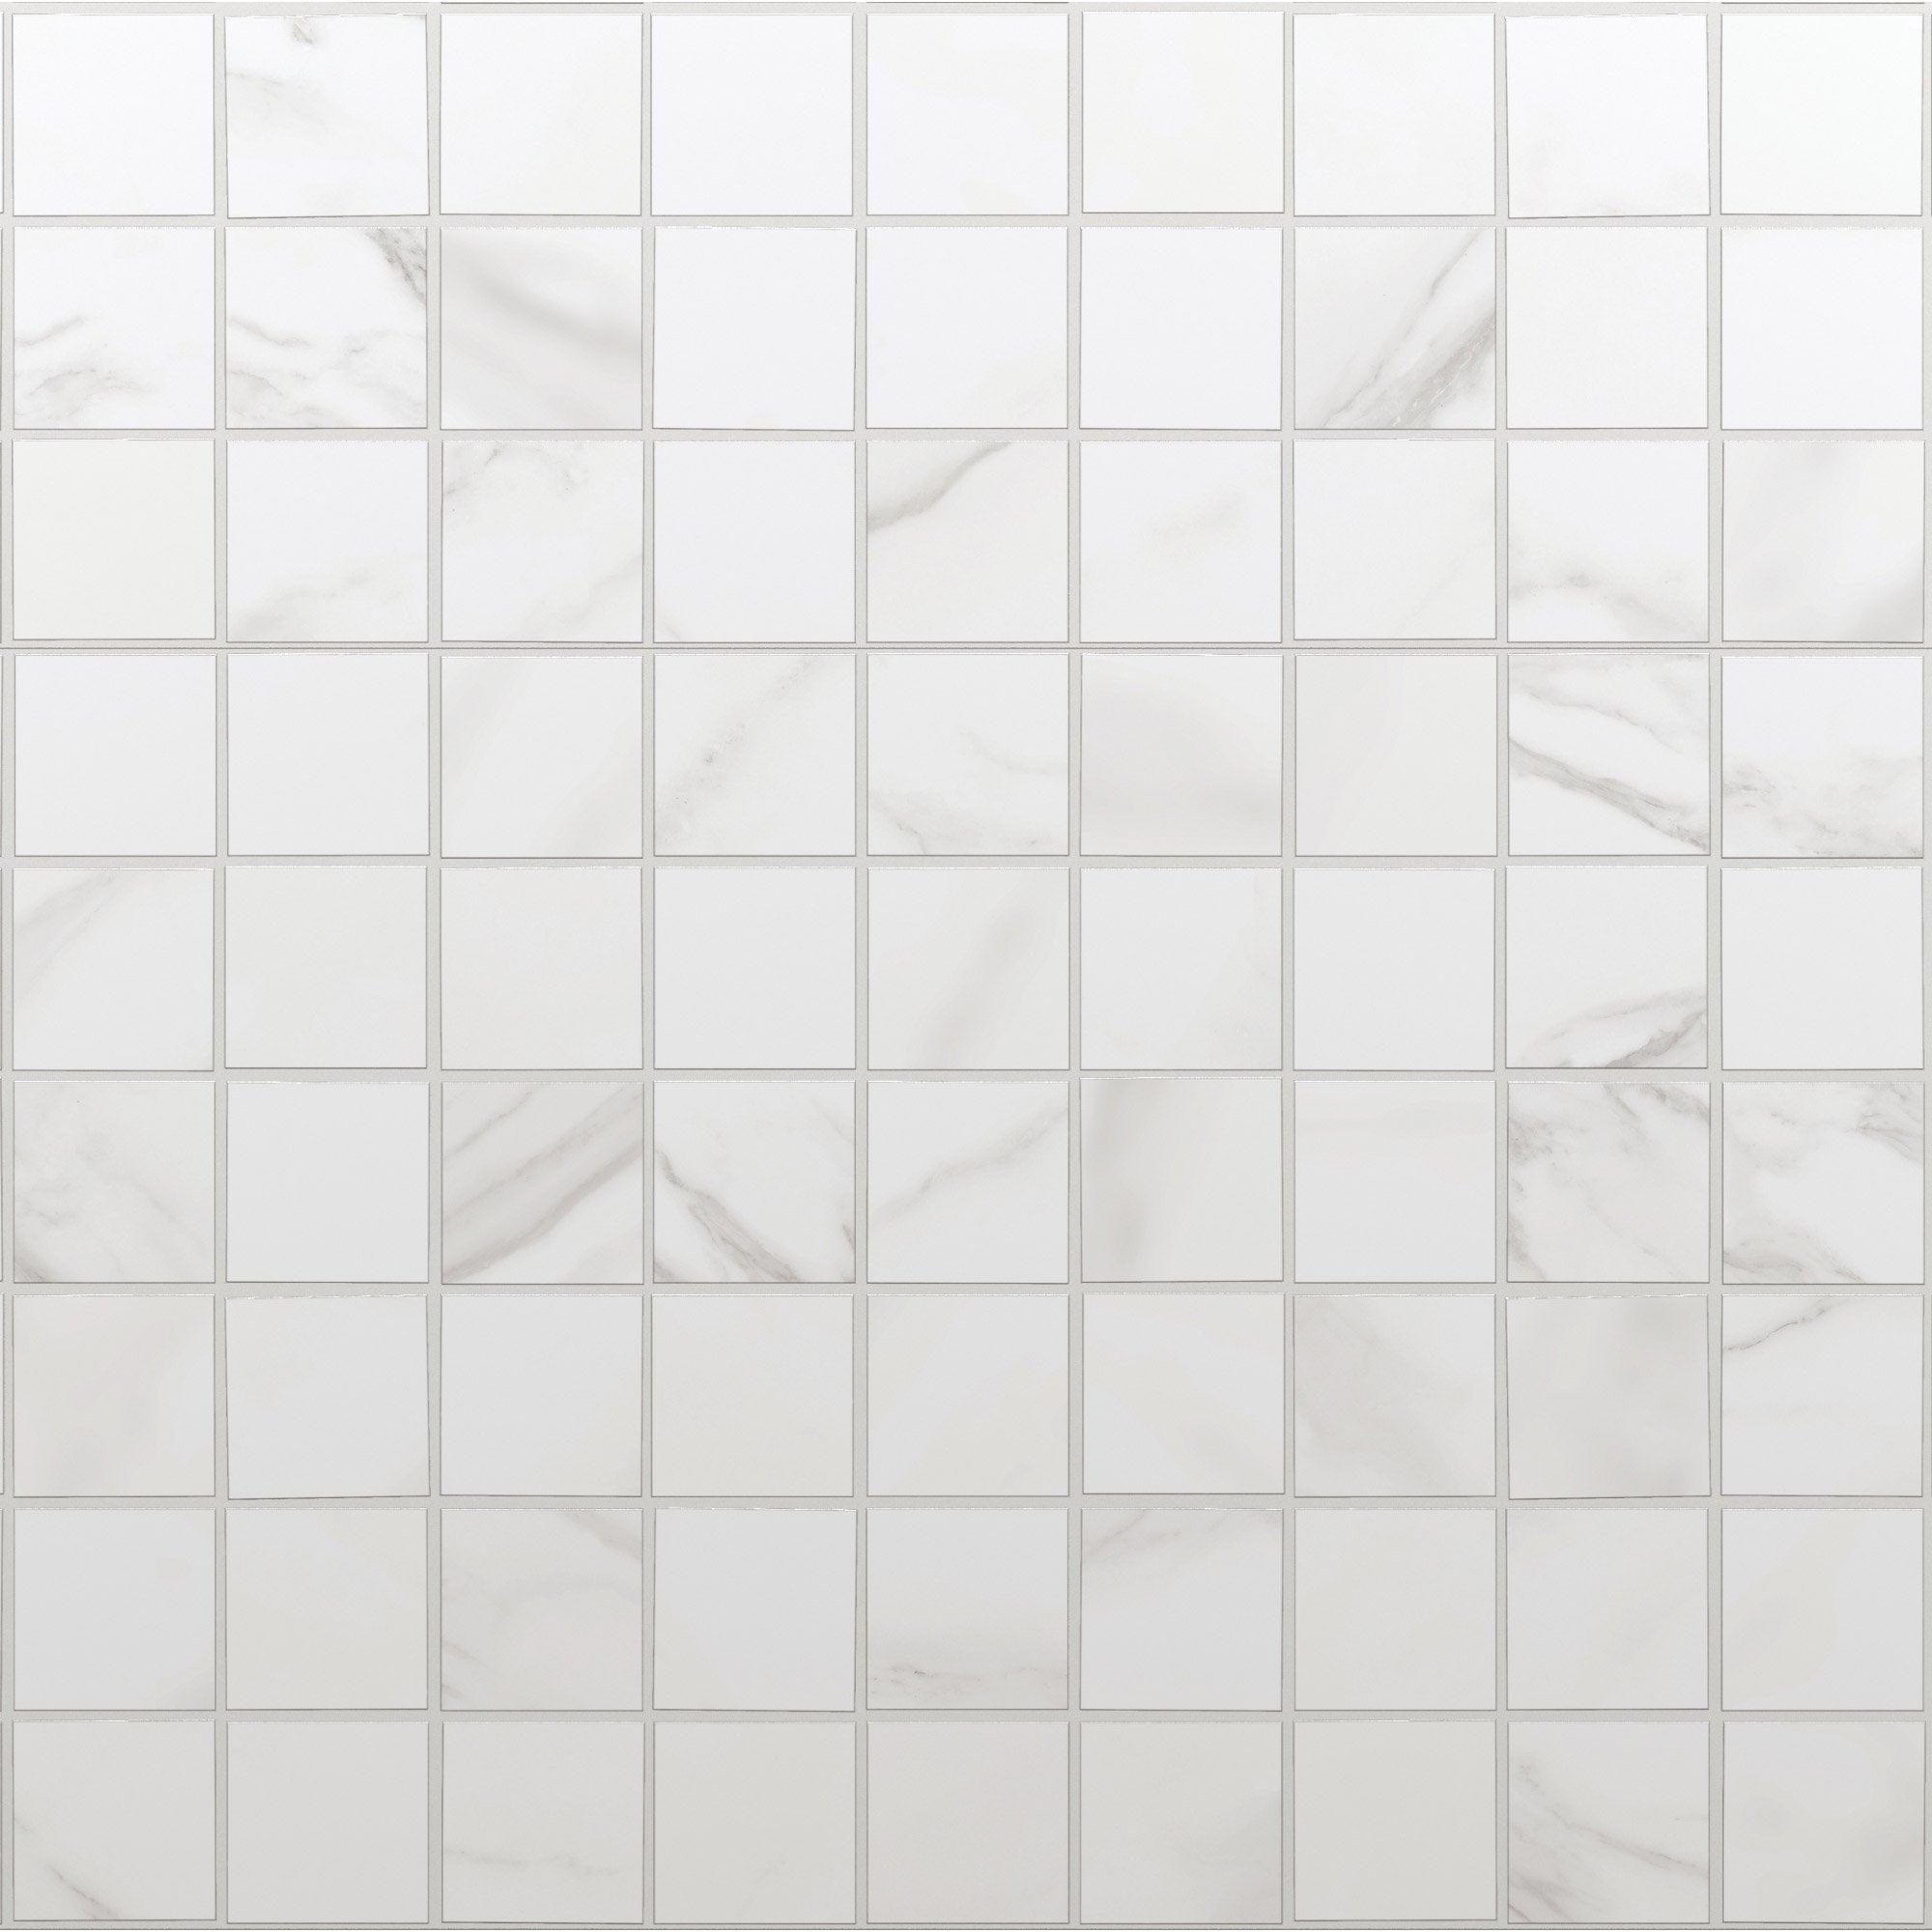 Mosaïque sol et mur Murano blanc carrare 30 x 30 cm